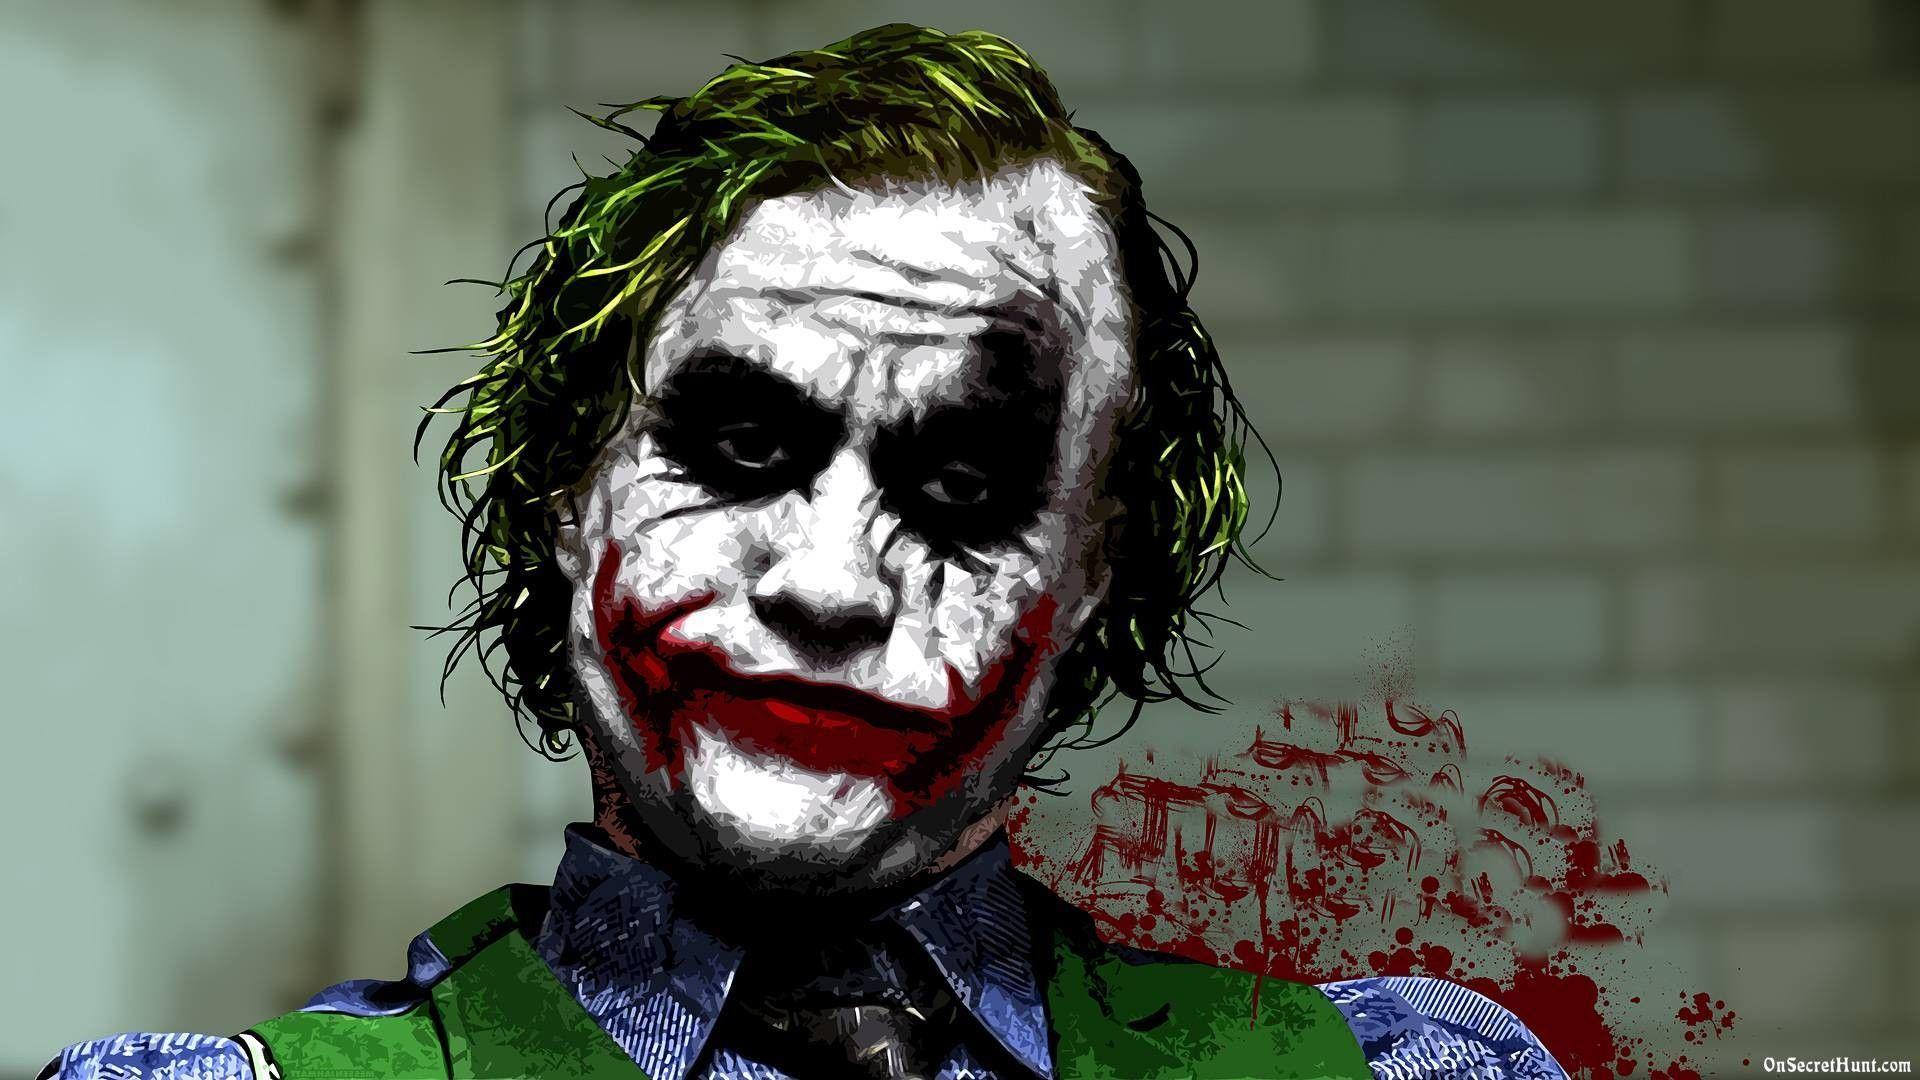 1920x1080 Batman Joker Hd Wallpaper On Secret Hunt 1920x1080px Wallpaper Joker Hd Wallpaper Joker Painting Joker Wallpaper